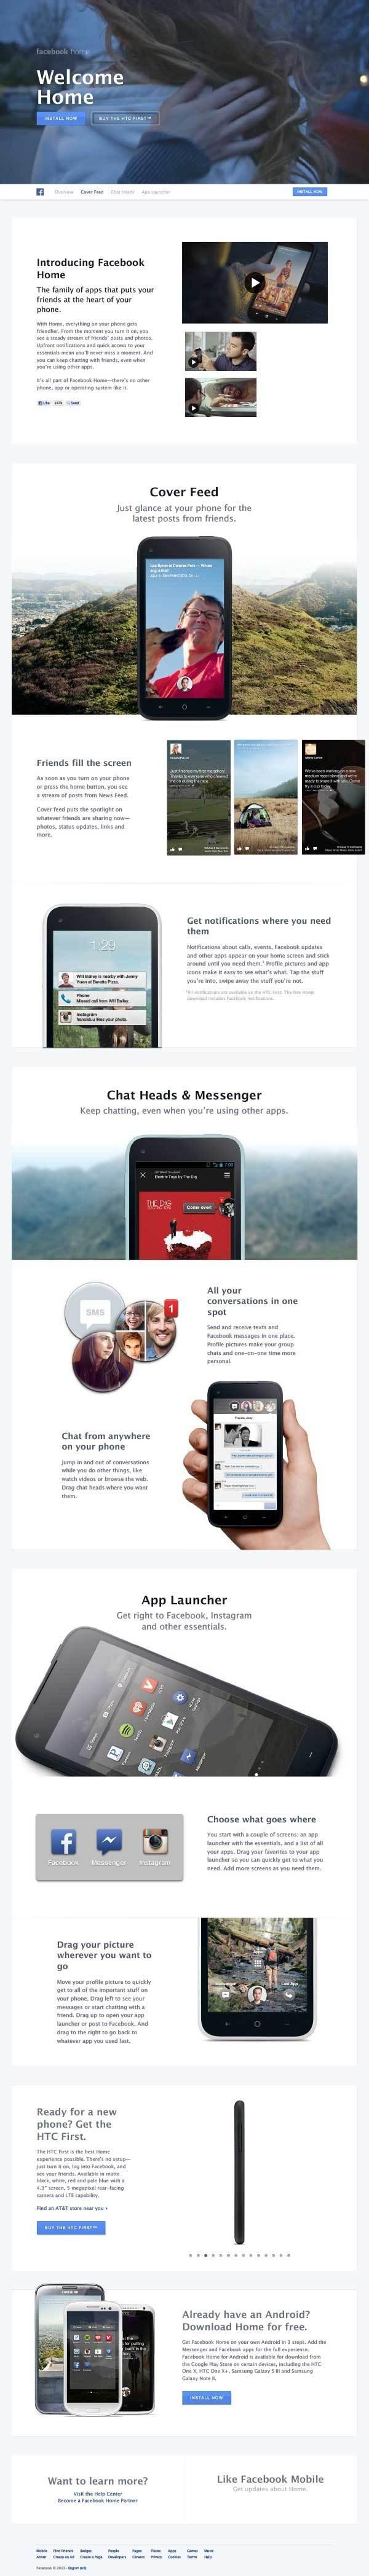 facebook #design #web #ui